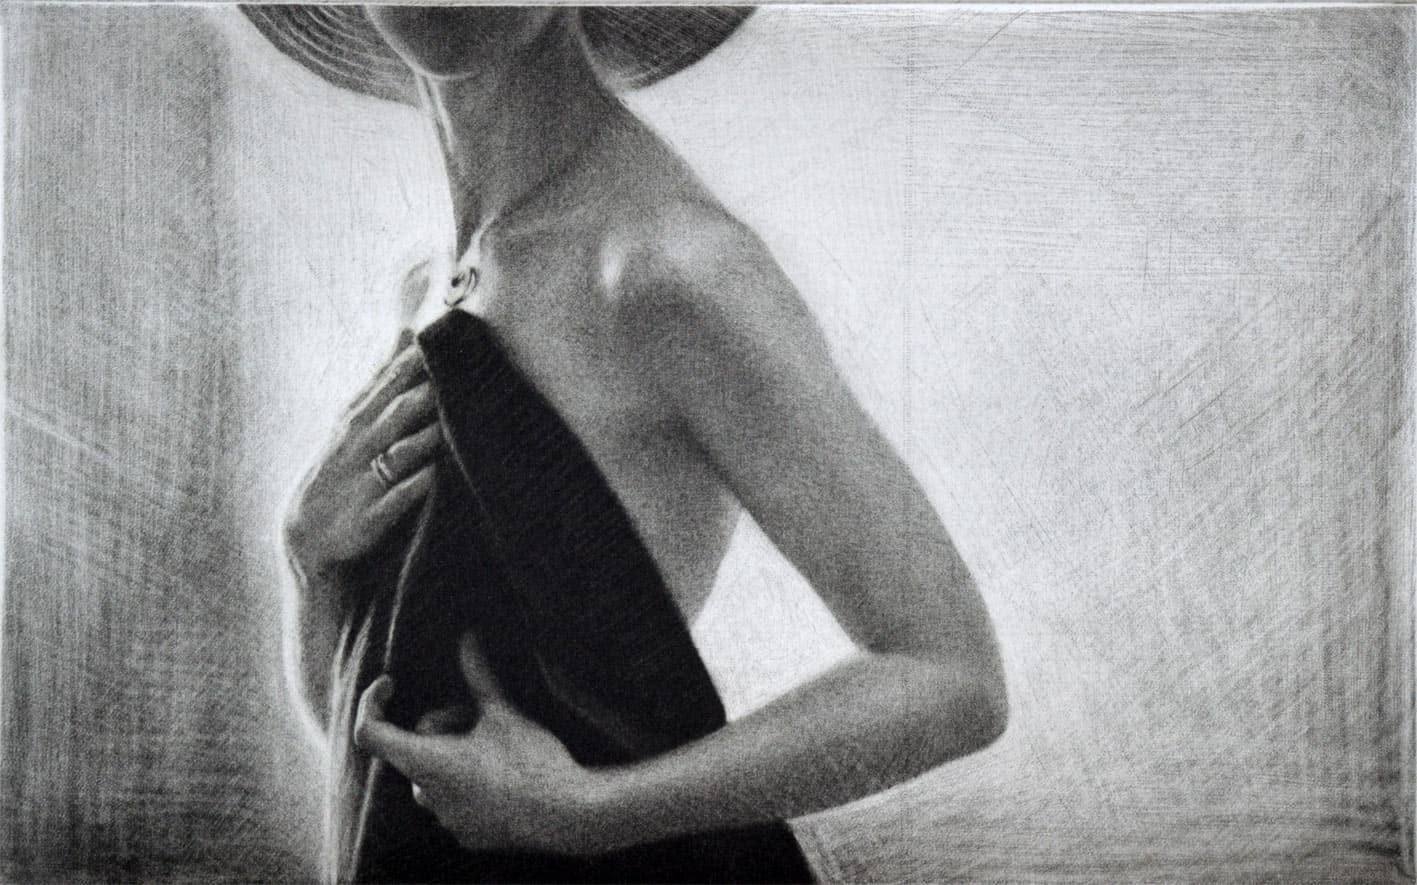 """Sun"" 3 - Female model wrapping herself in a shawl. Original print mezzotint by painter-printmaker Marina Kim"